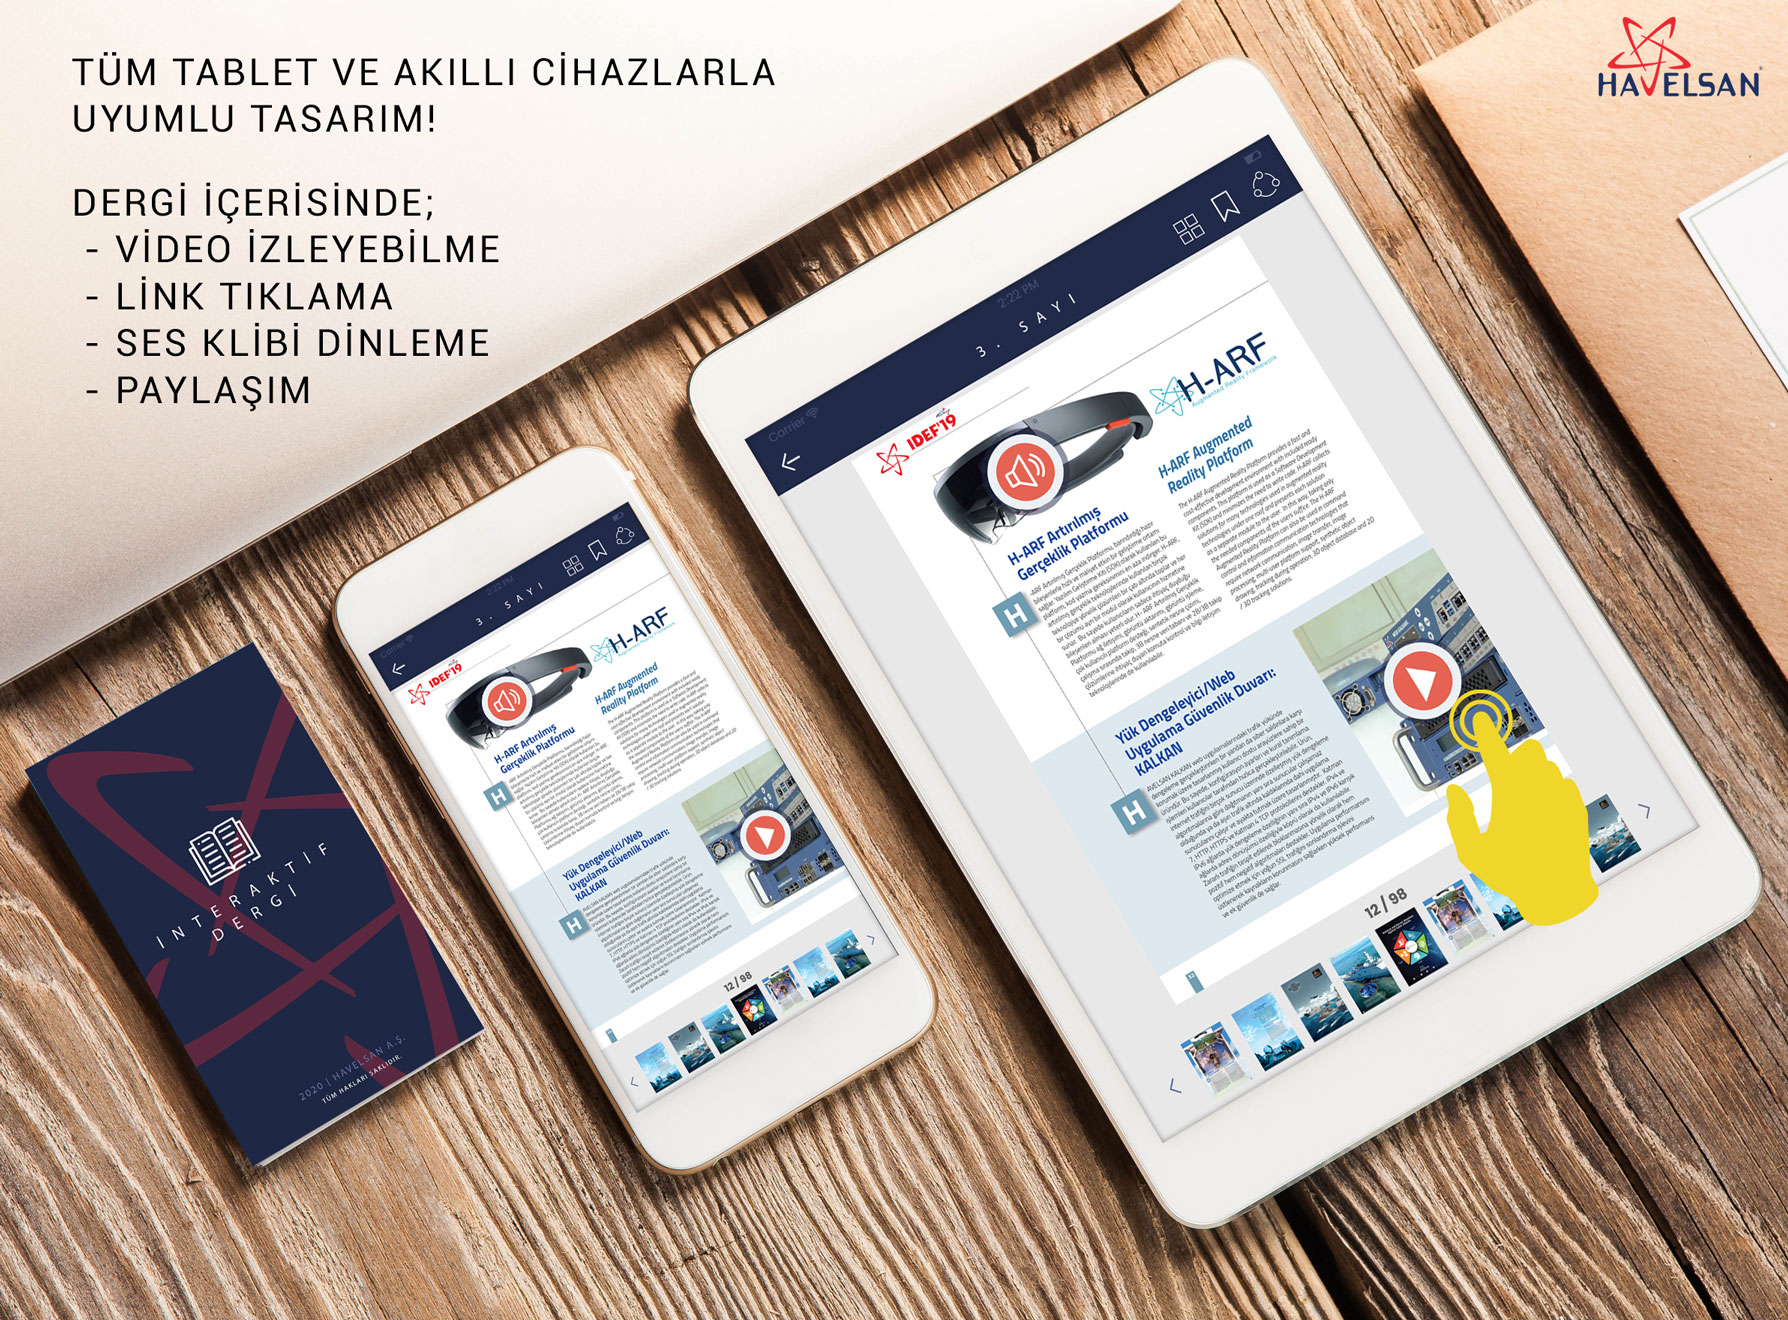 5. Dergi Okuma Sayfasi Tablet